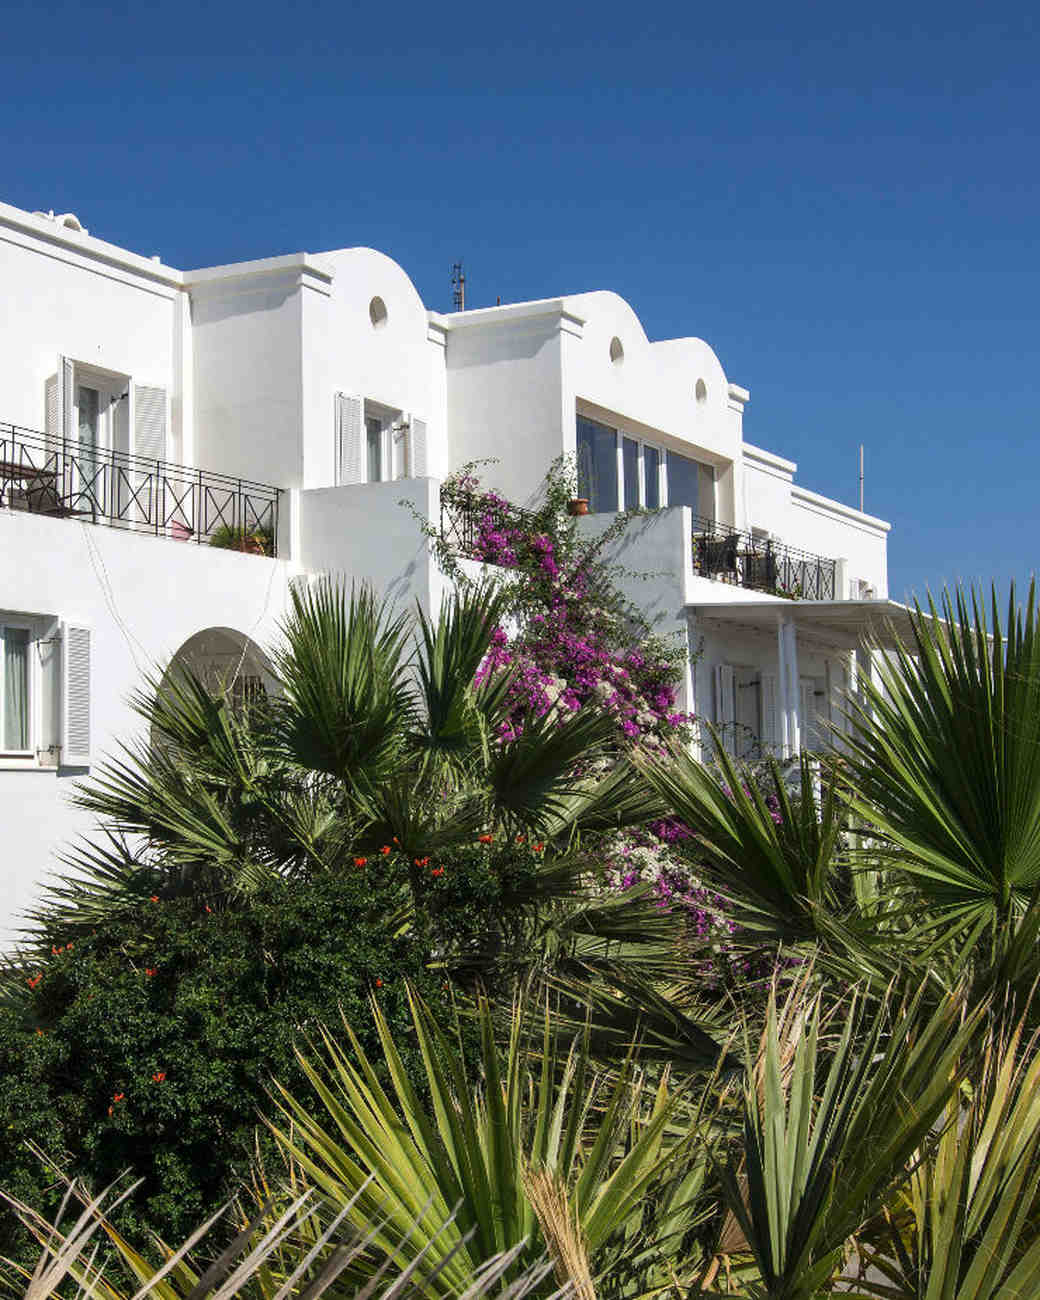 airbnb-wedding-venues-santorini-aegean-islands-greece-0515.jpg